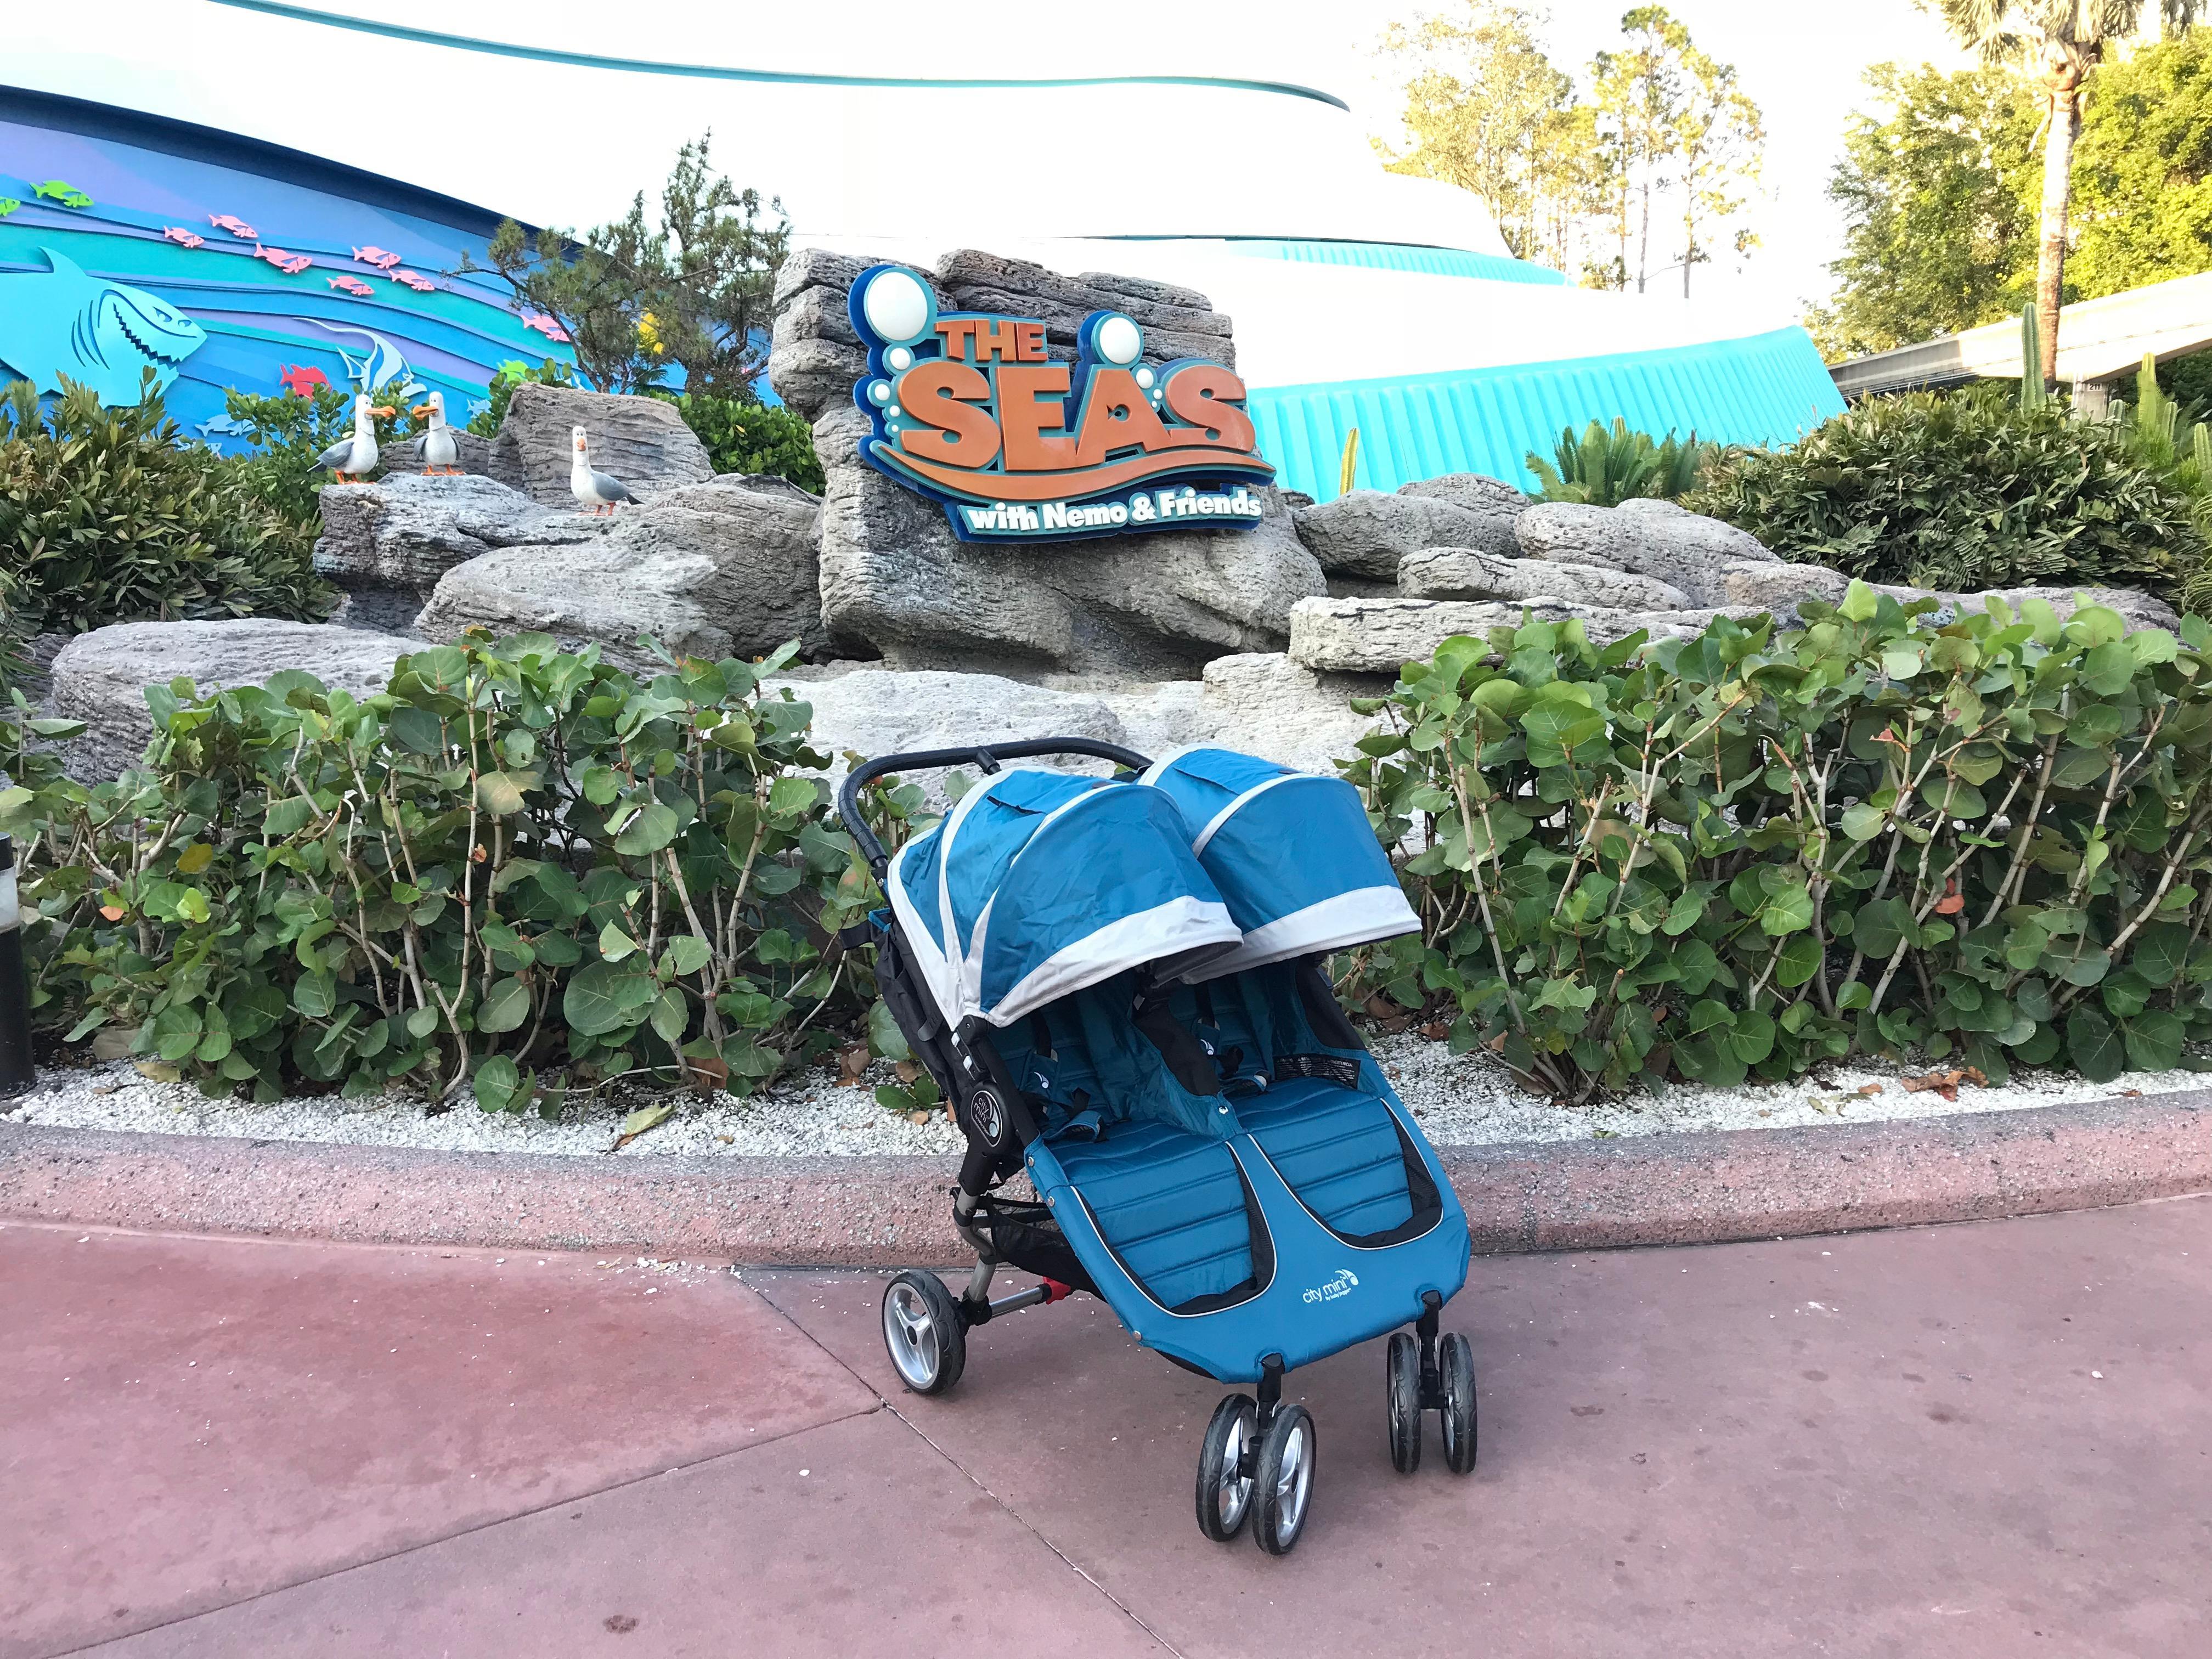 Stroller Rentals Disney image 45